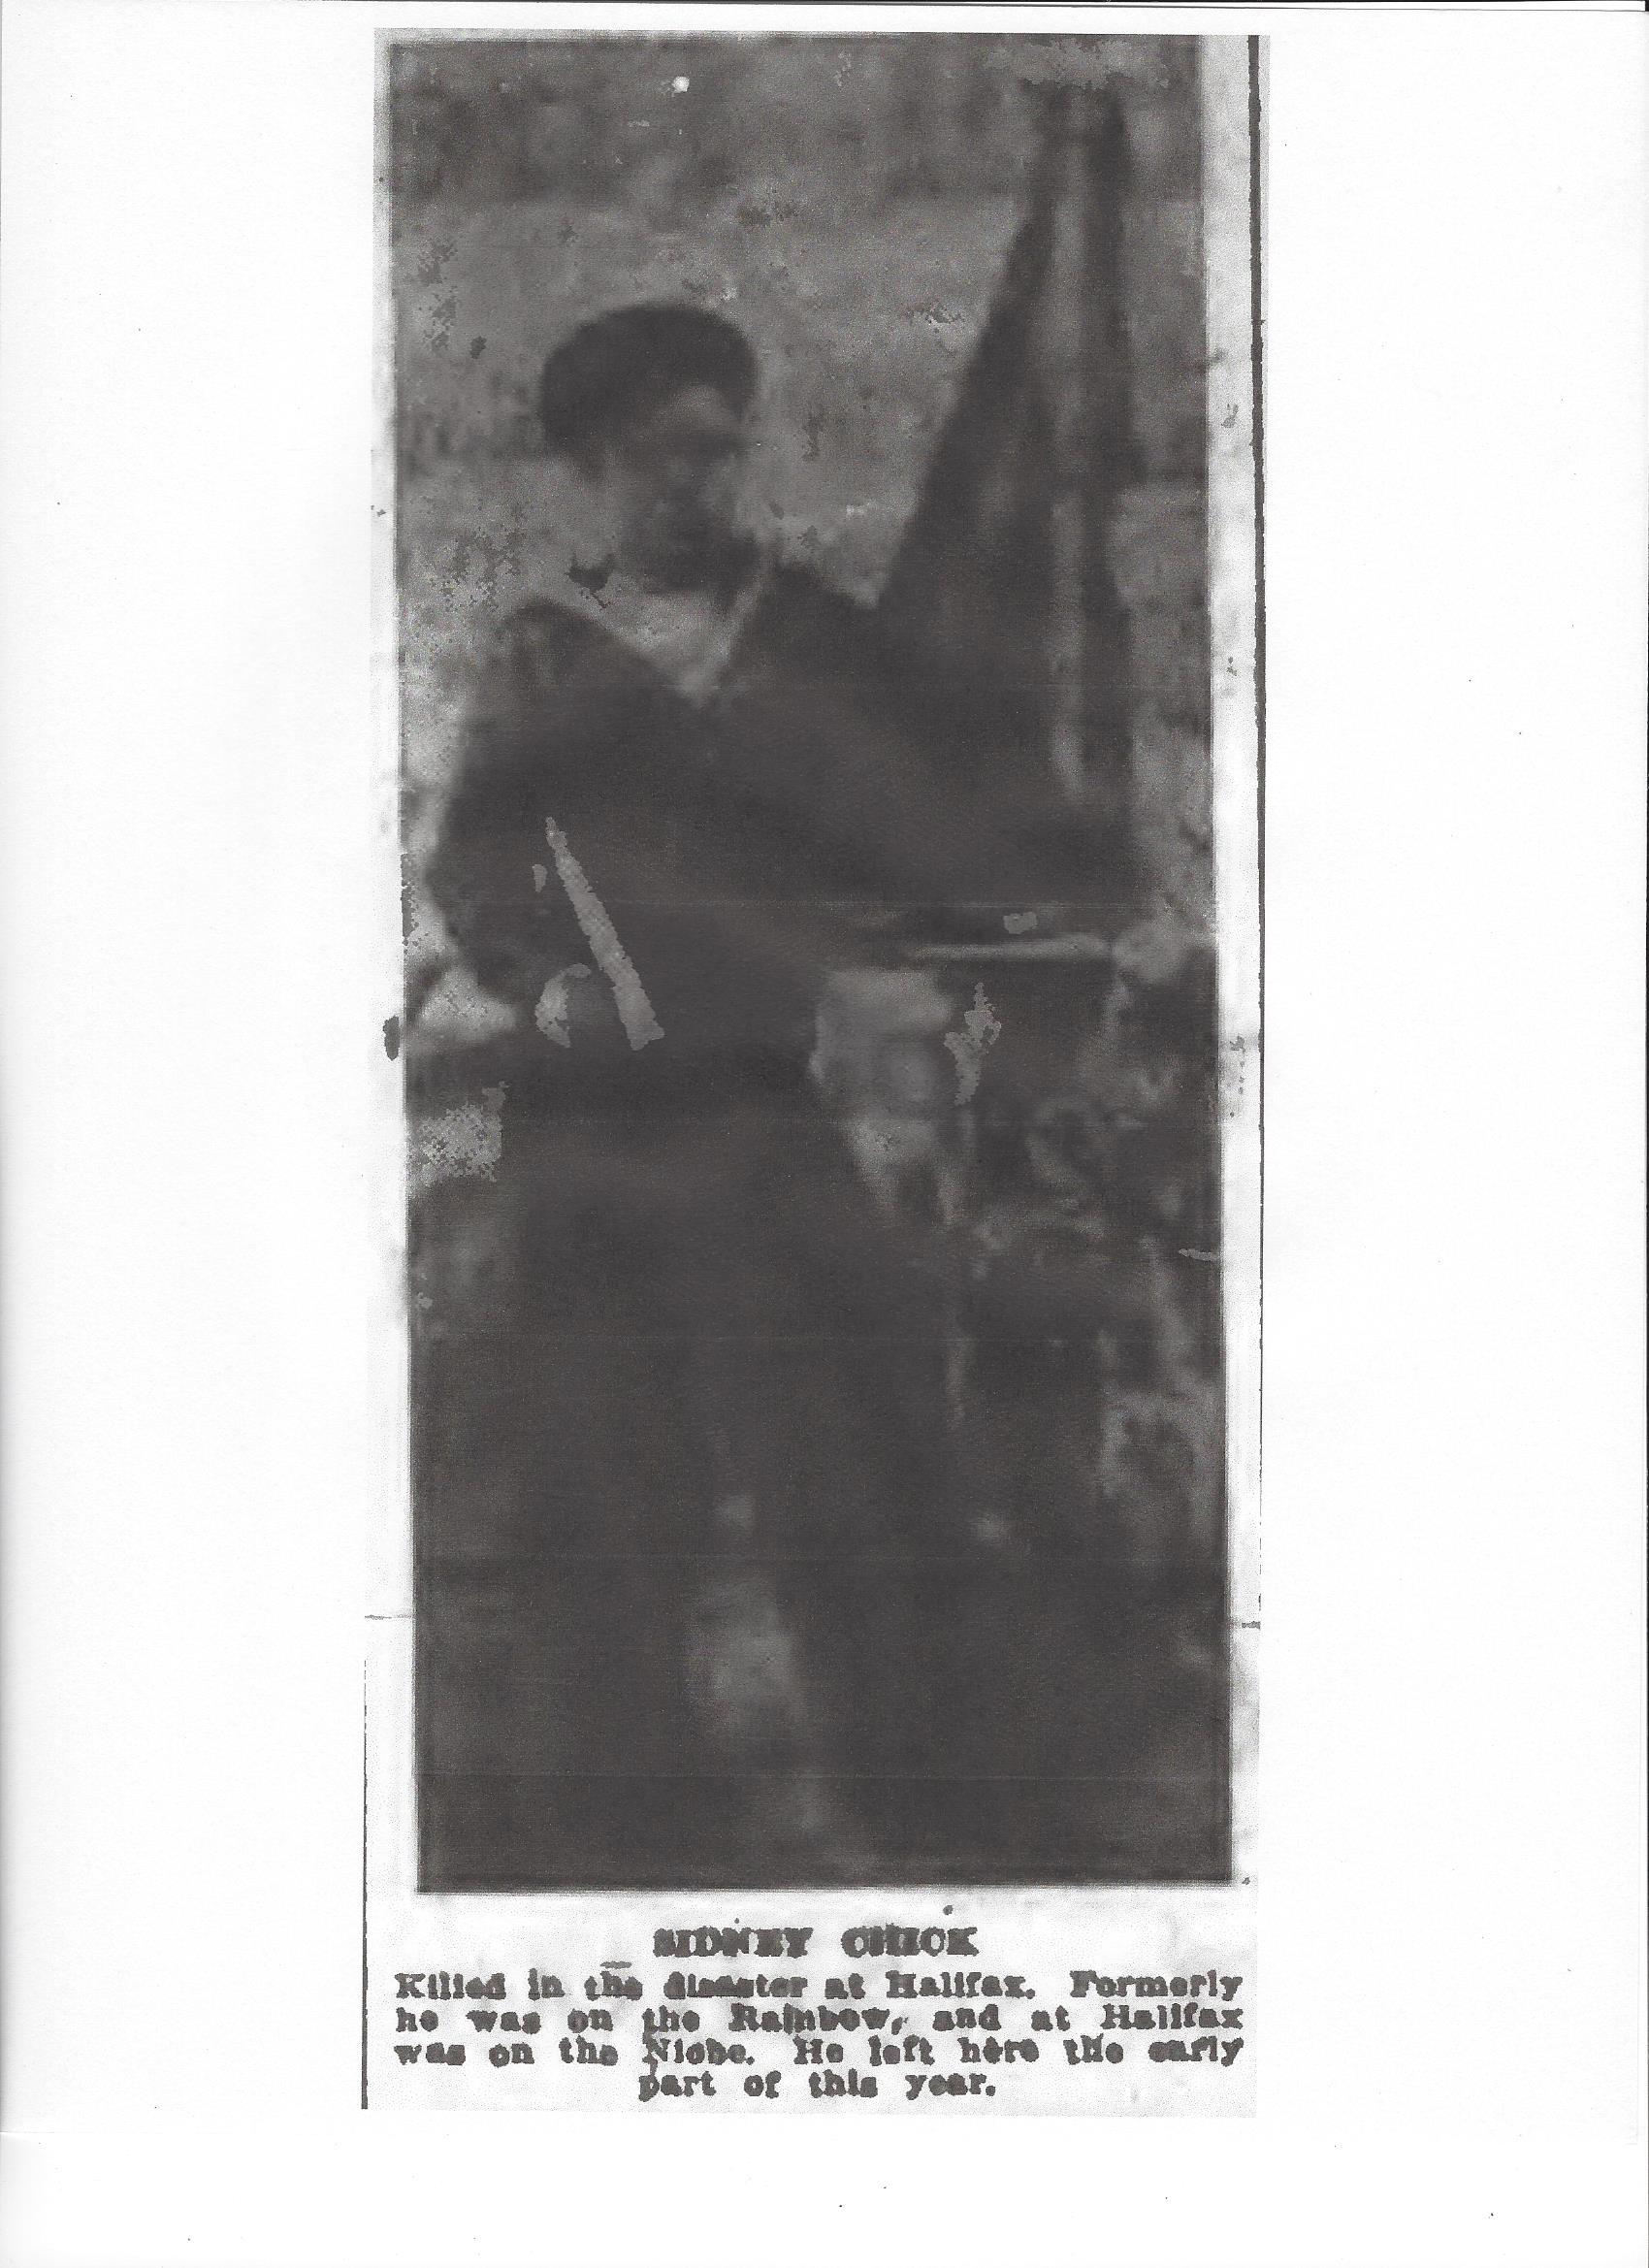 Photo of SIDNEY CHICK